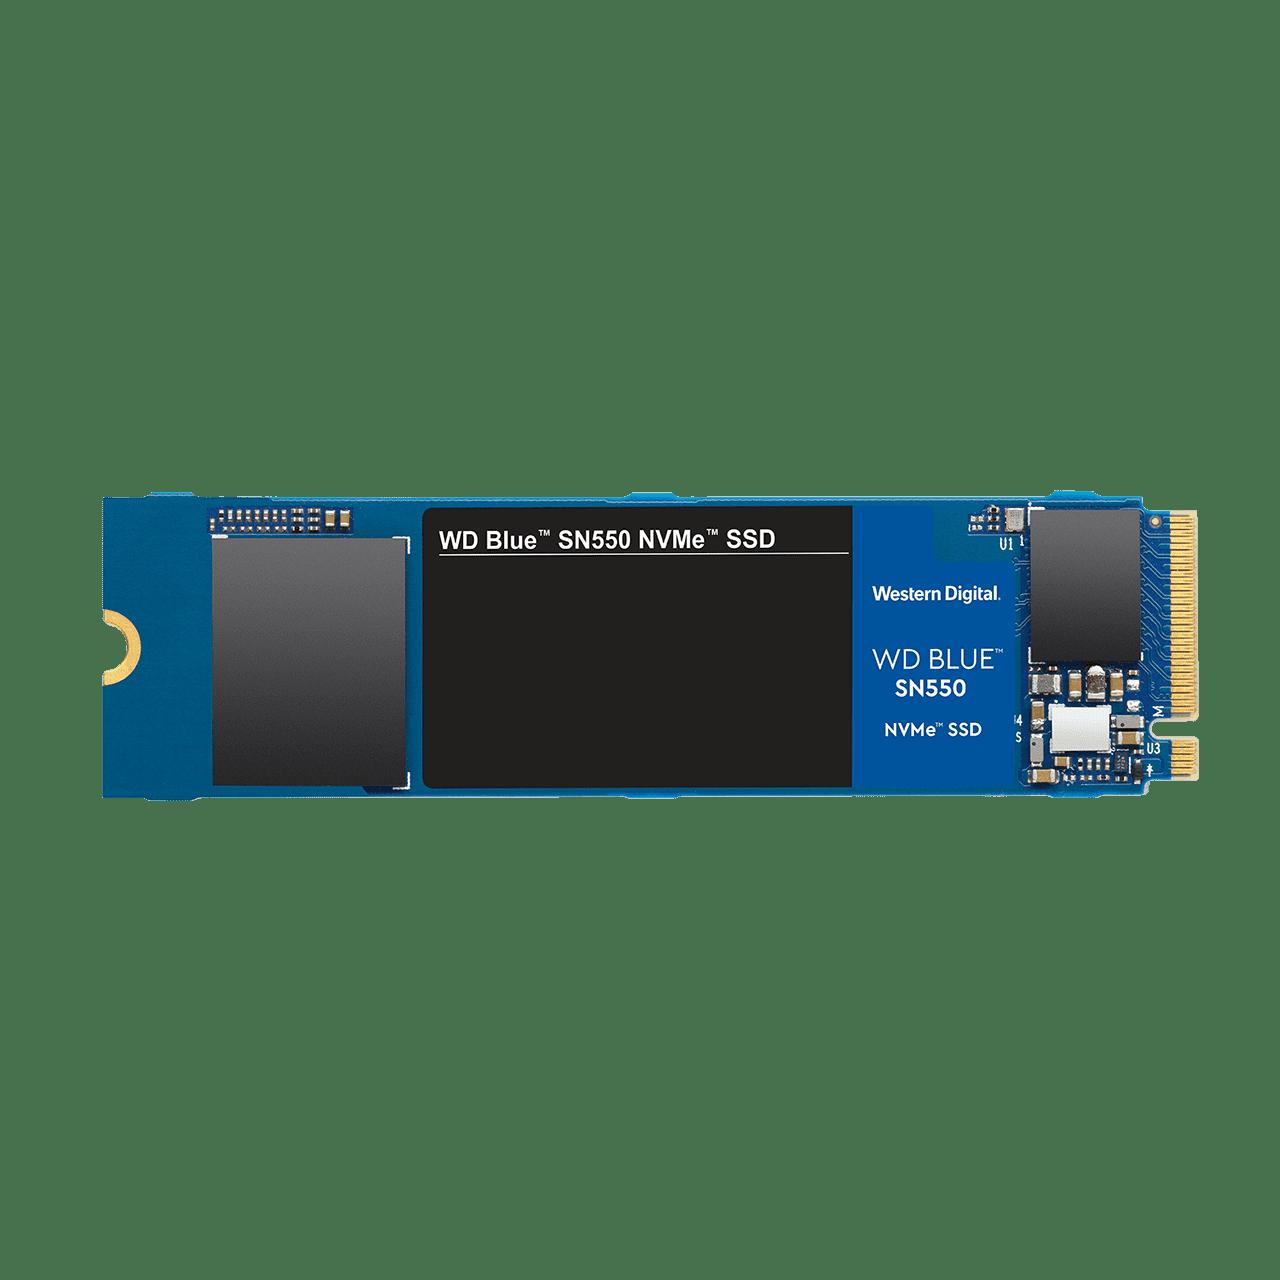 wd-blue-sn550-nvme-ssd-png-thumb-1280-1280-2